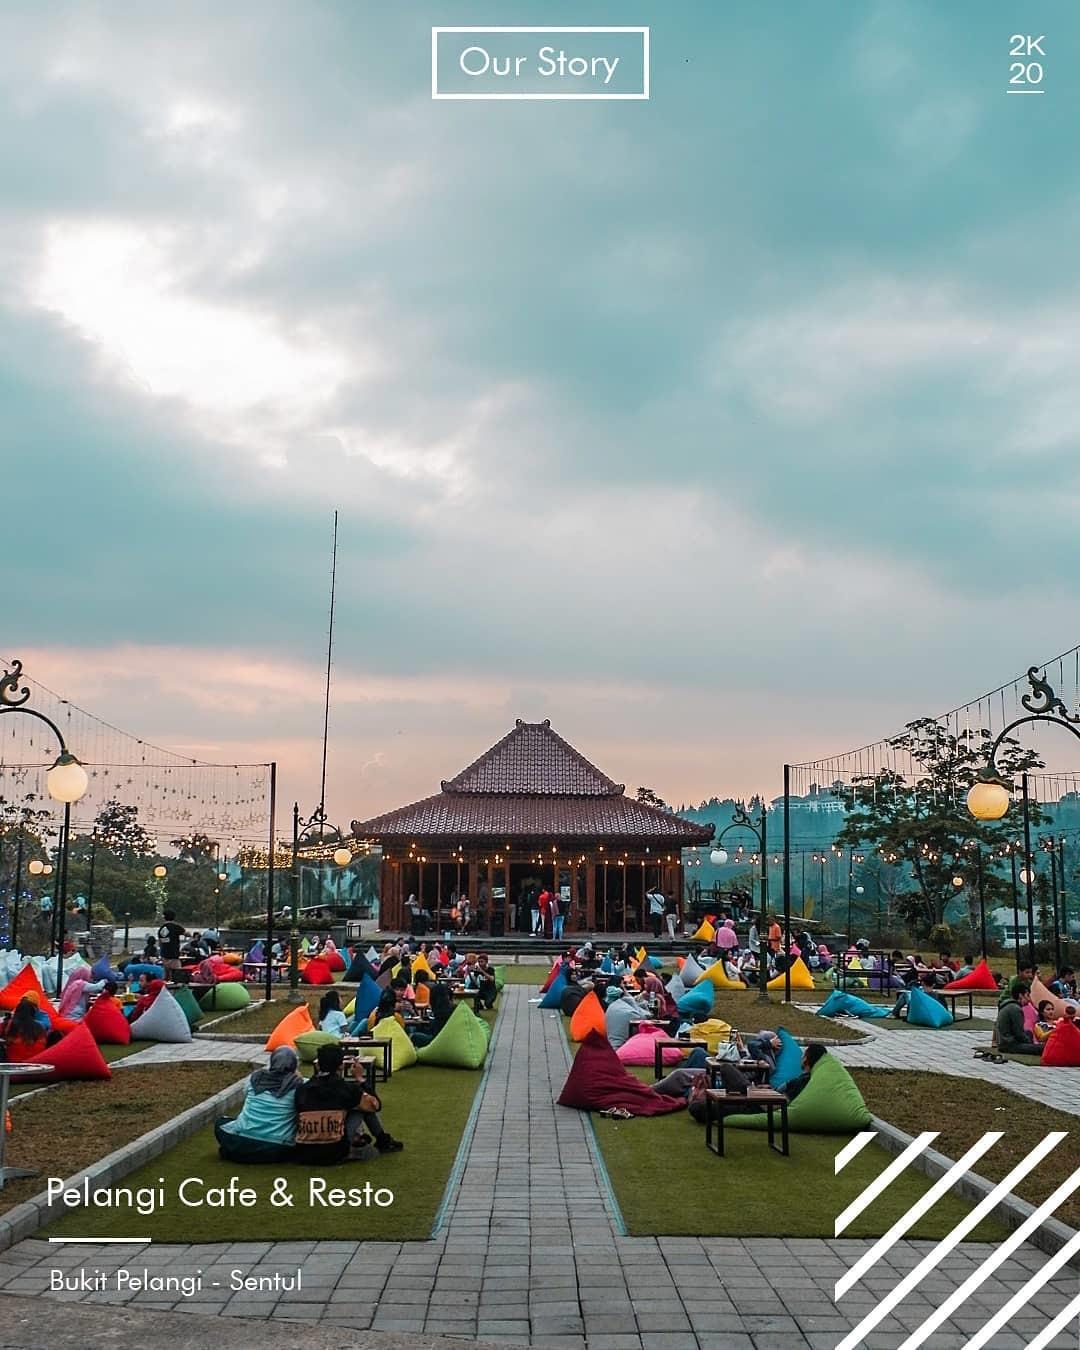 Cafe Pelangi Gunung Geulis Bogor